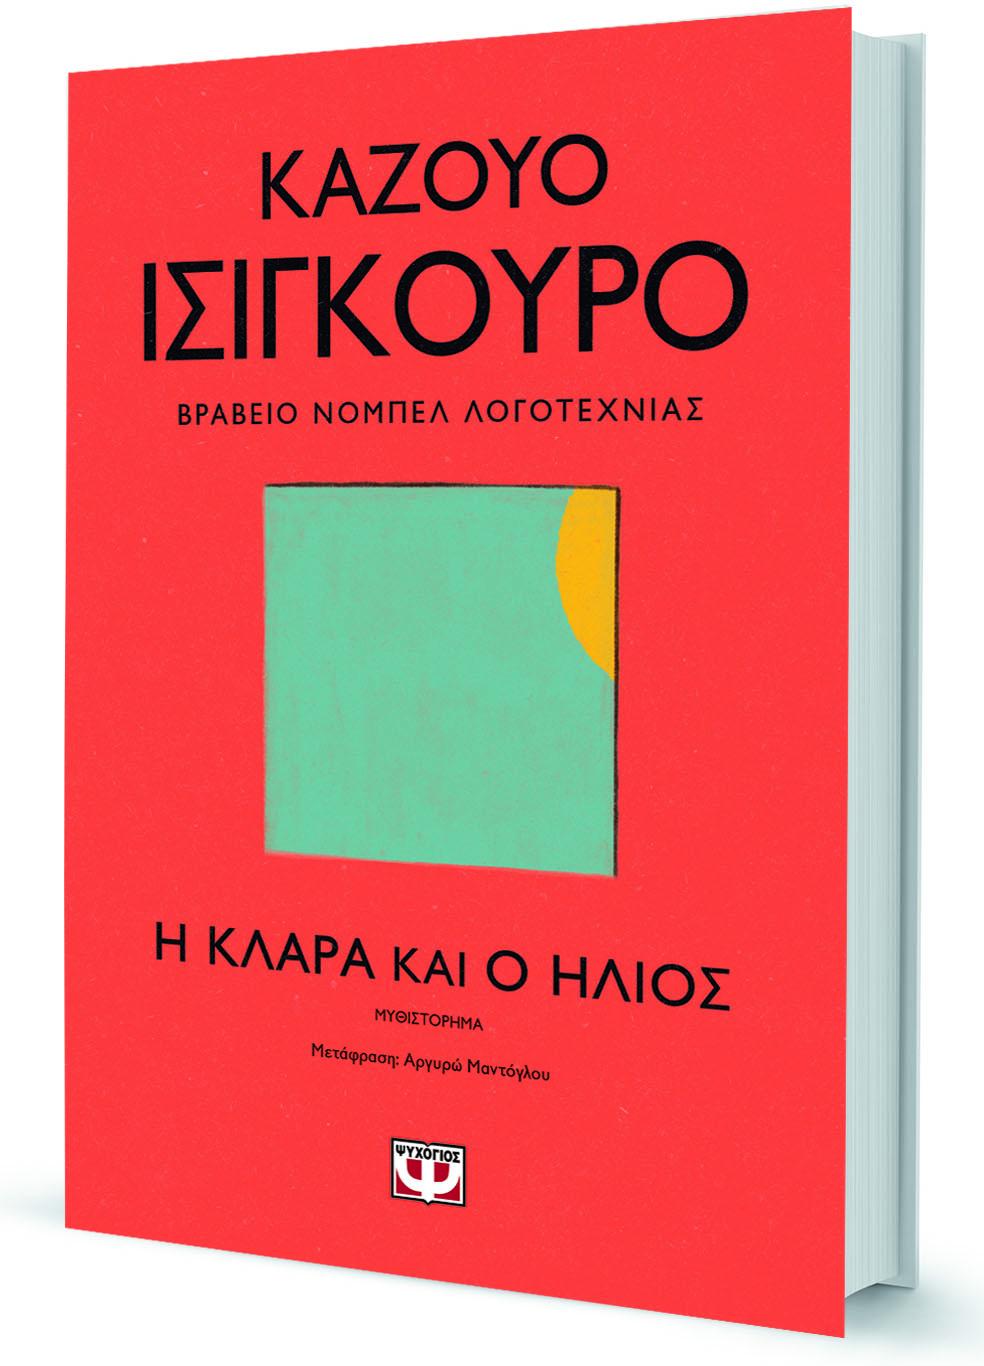 ta-pragmata-ochi-mono-allazoyn-mallon-den-itan-pote-opos-nomizame1